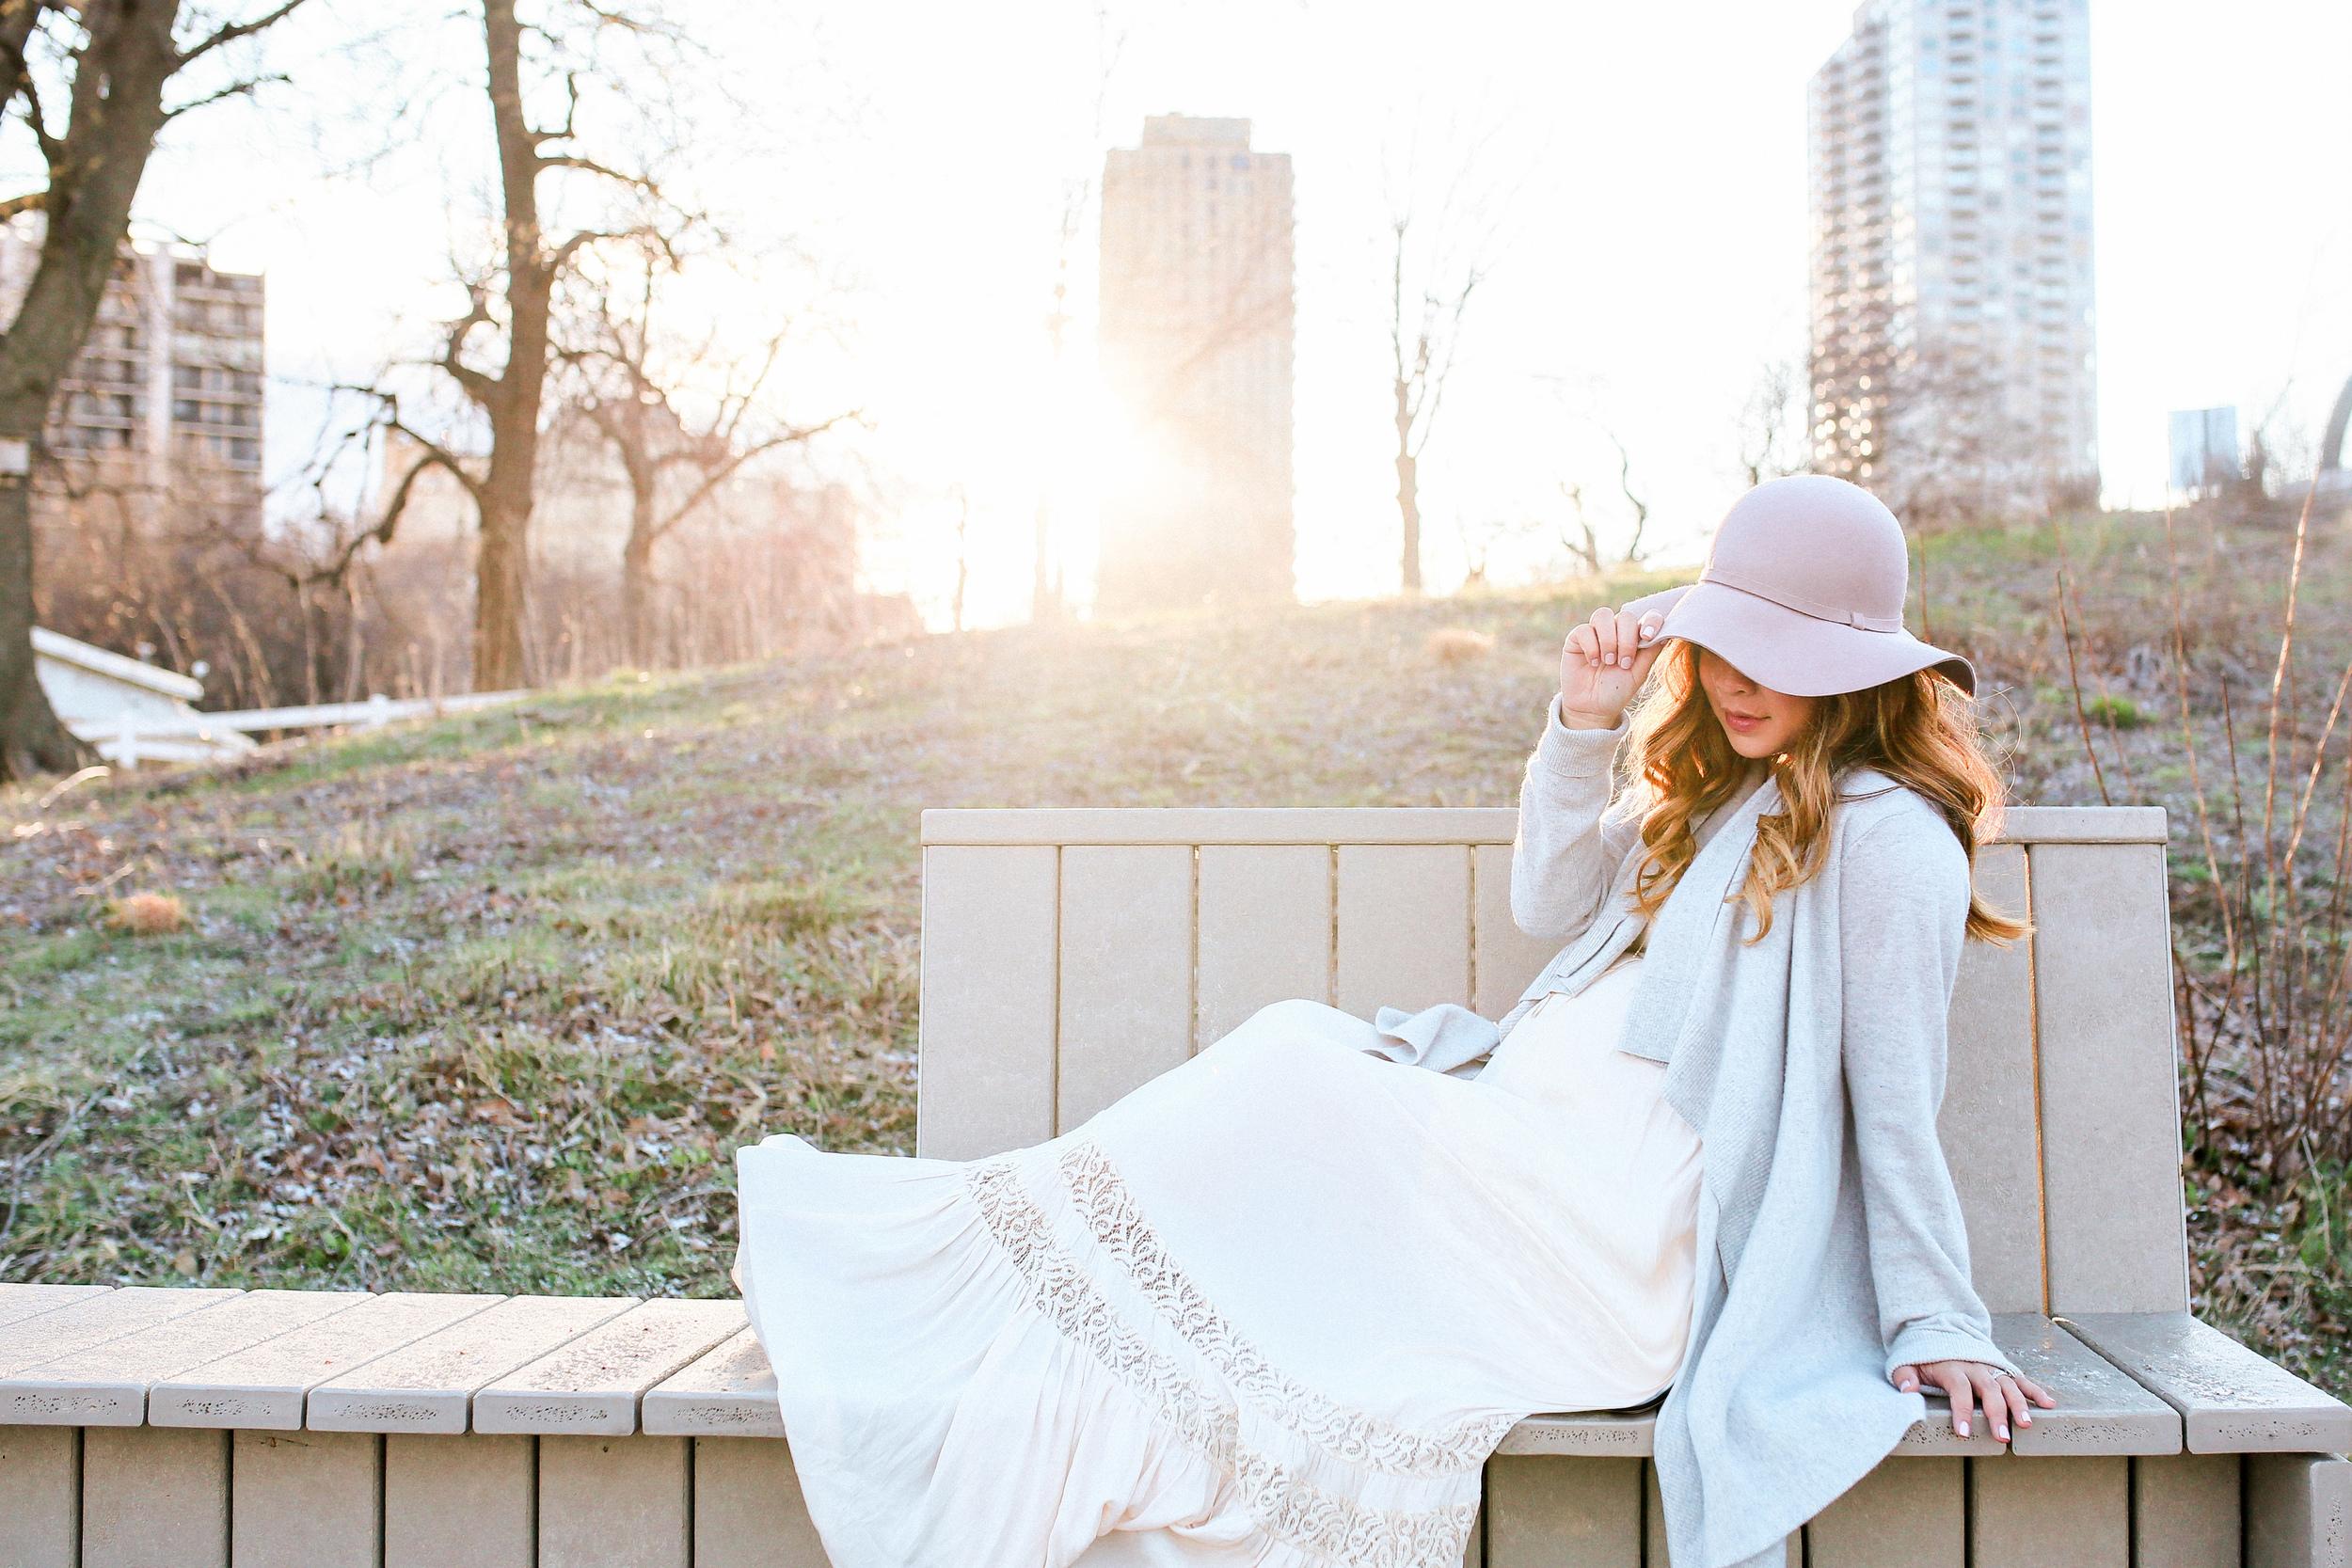 jenny grimm chicago maternity lifestyle photographer